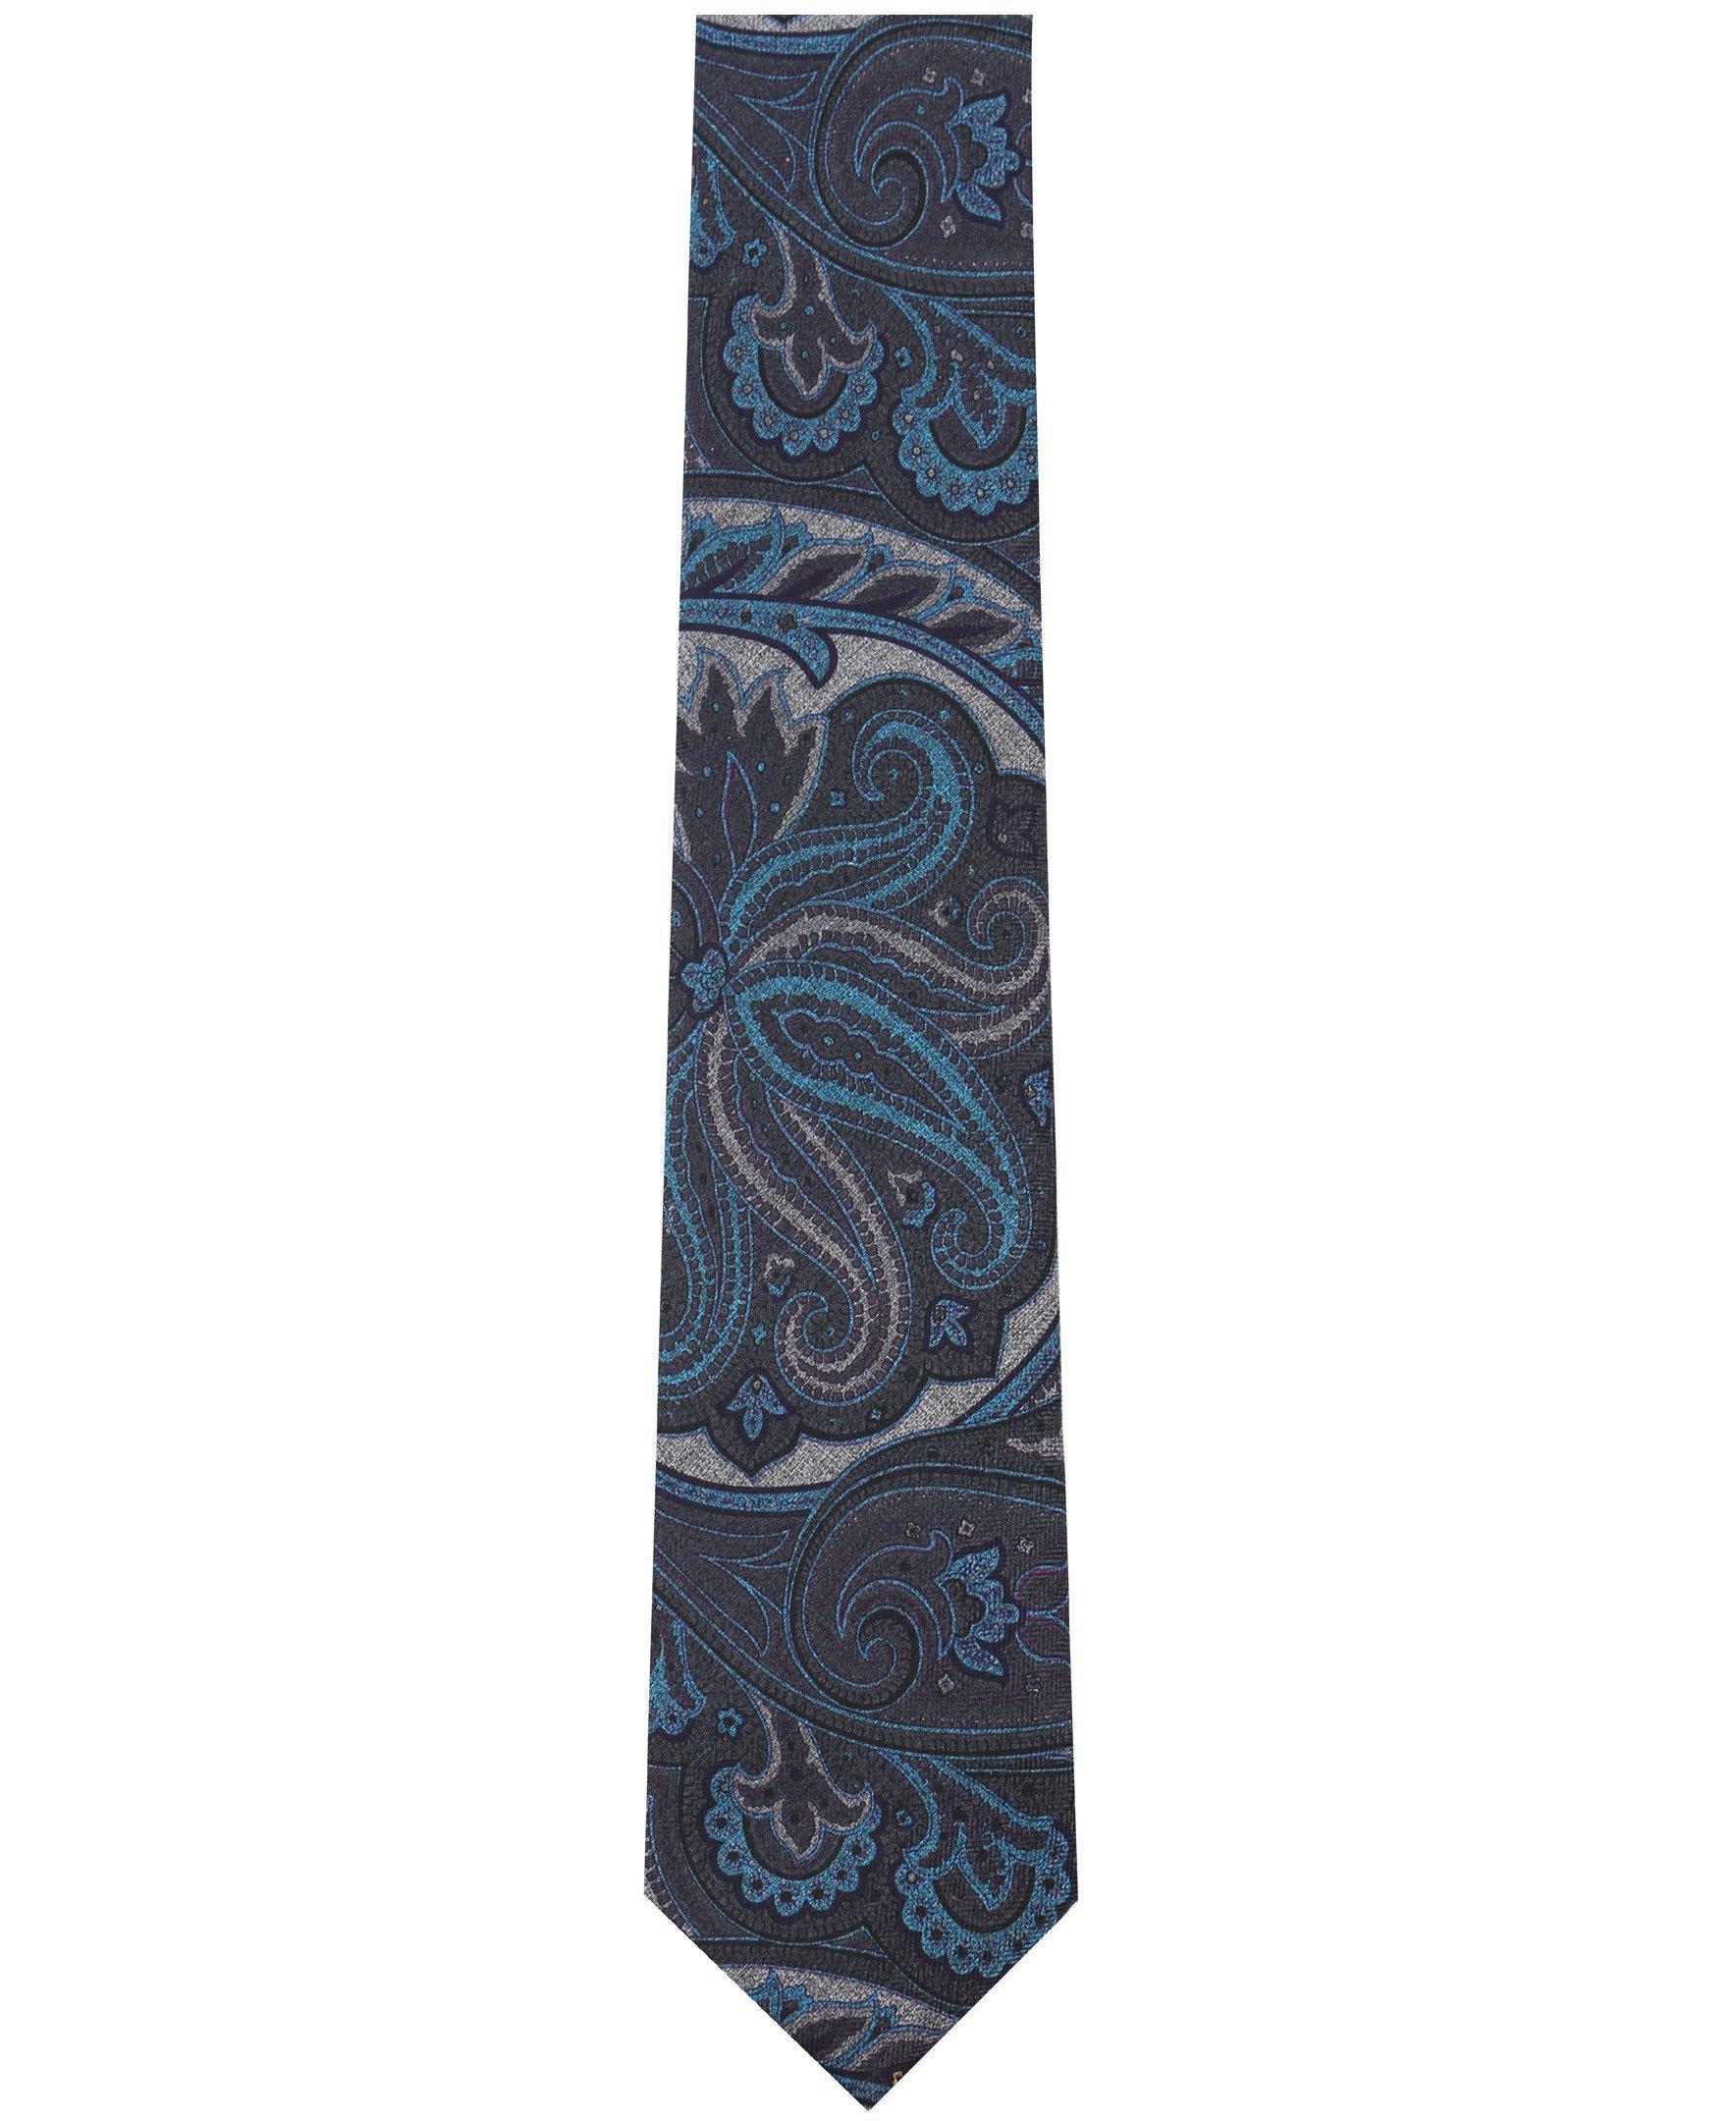 Nautica Men's Cargo Micros Tie, Charcoal, One Size